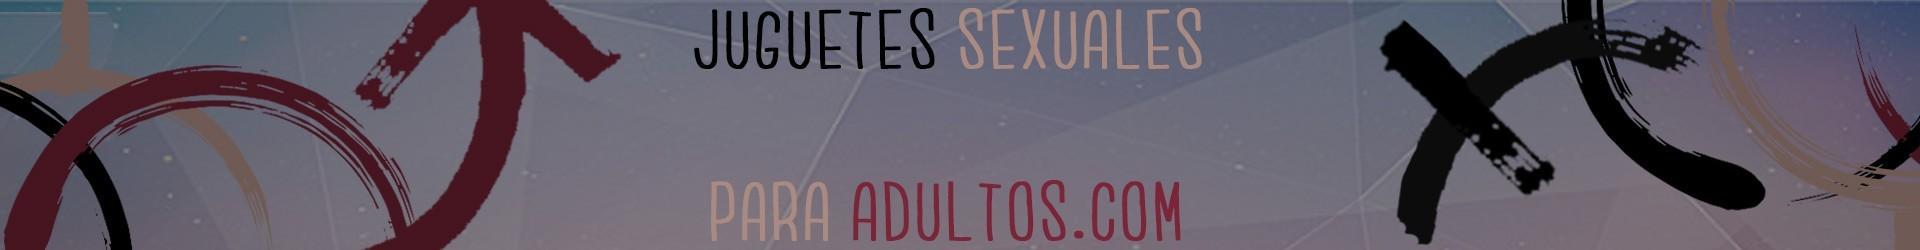 Plumas - Juguetes Sexuales para Adultos